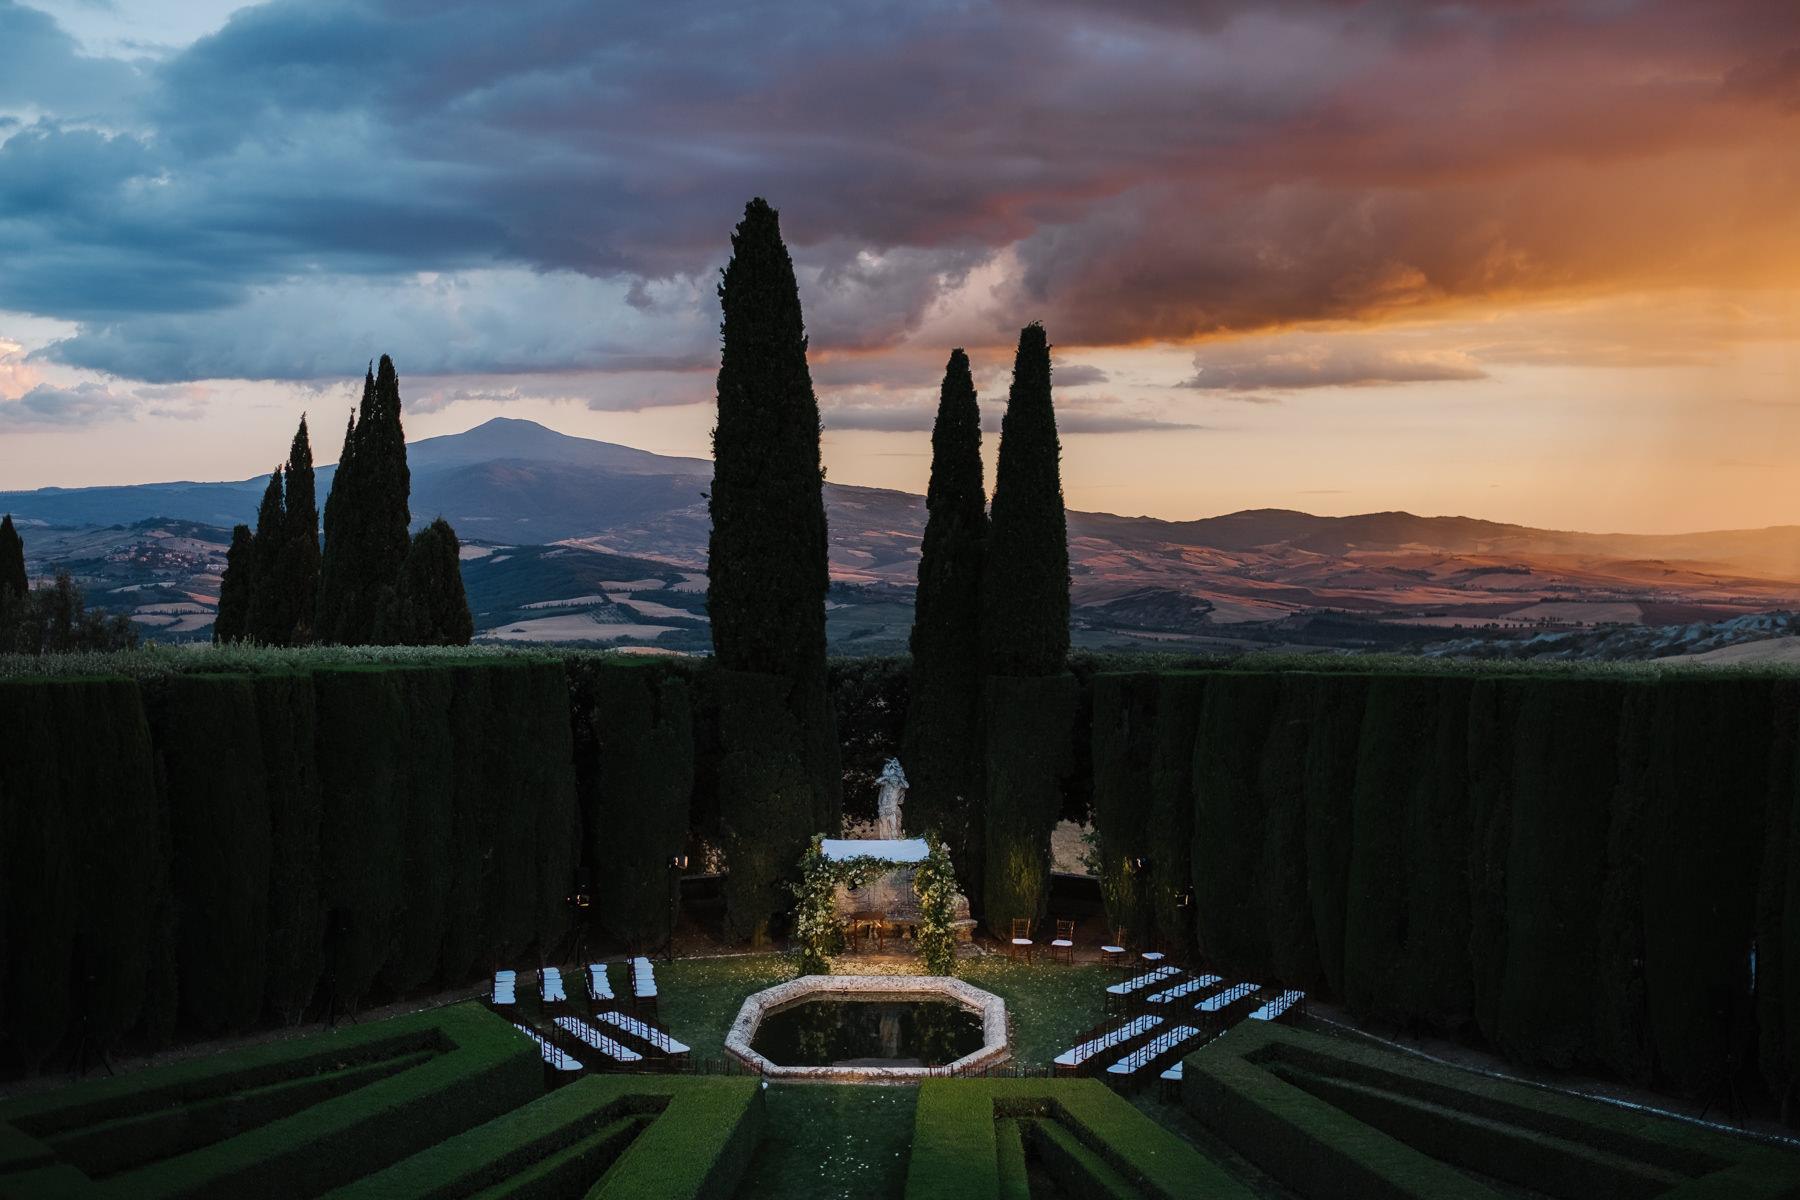 spectacular wedding venue in Italy